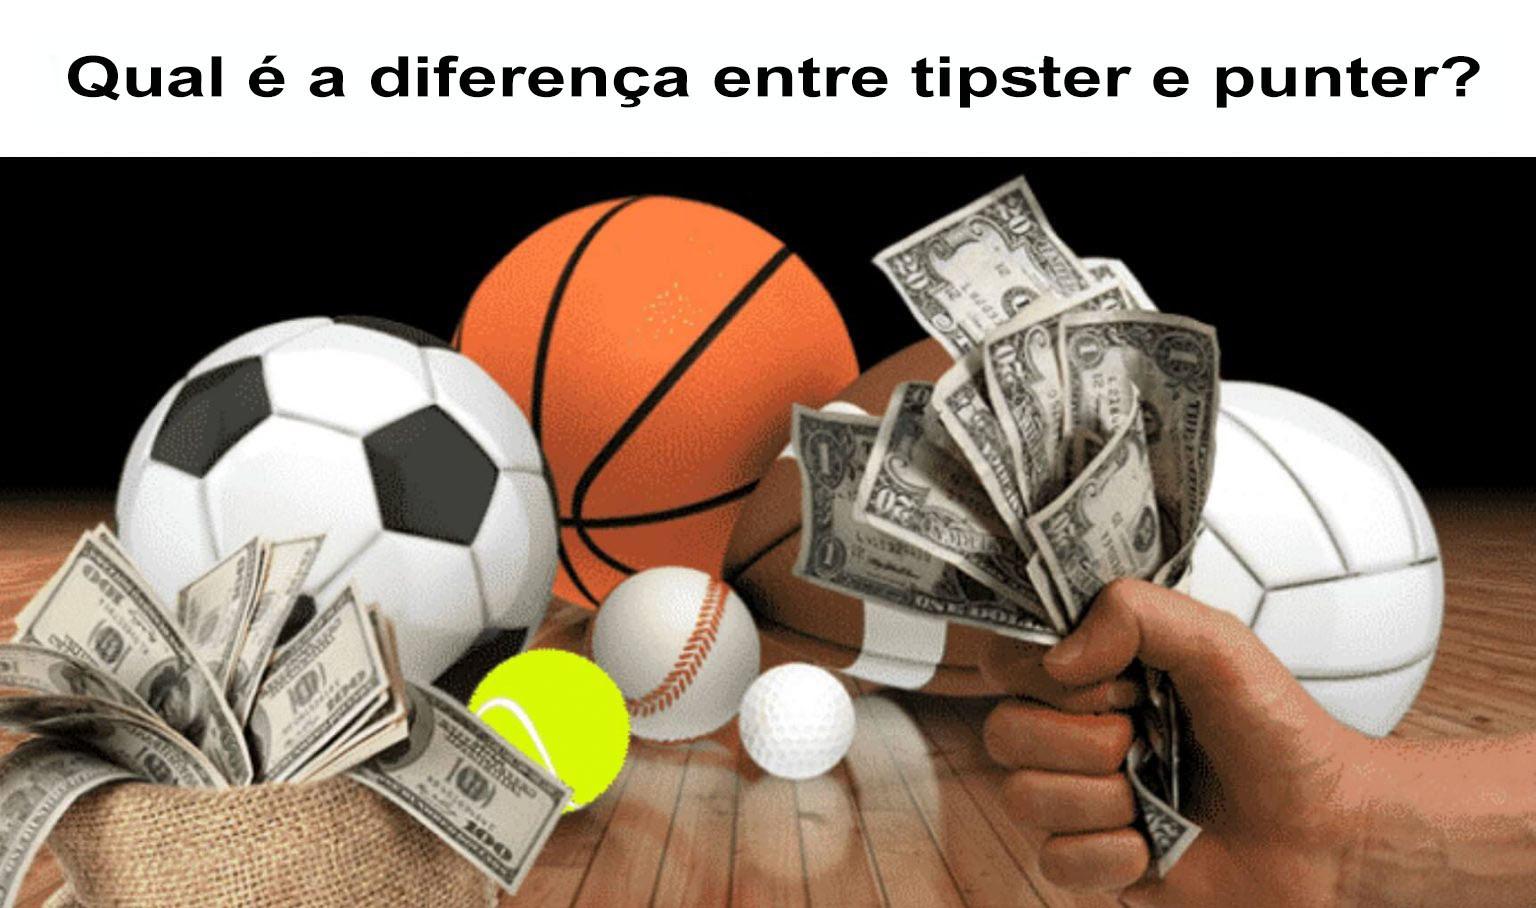 Diferença entre tipster e punter